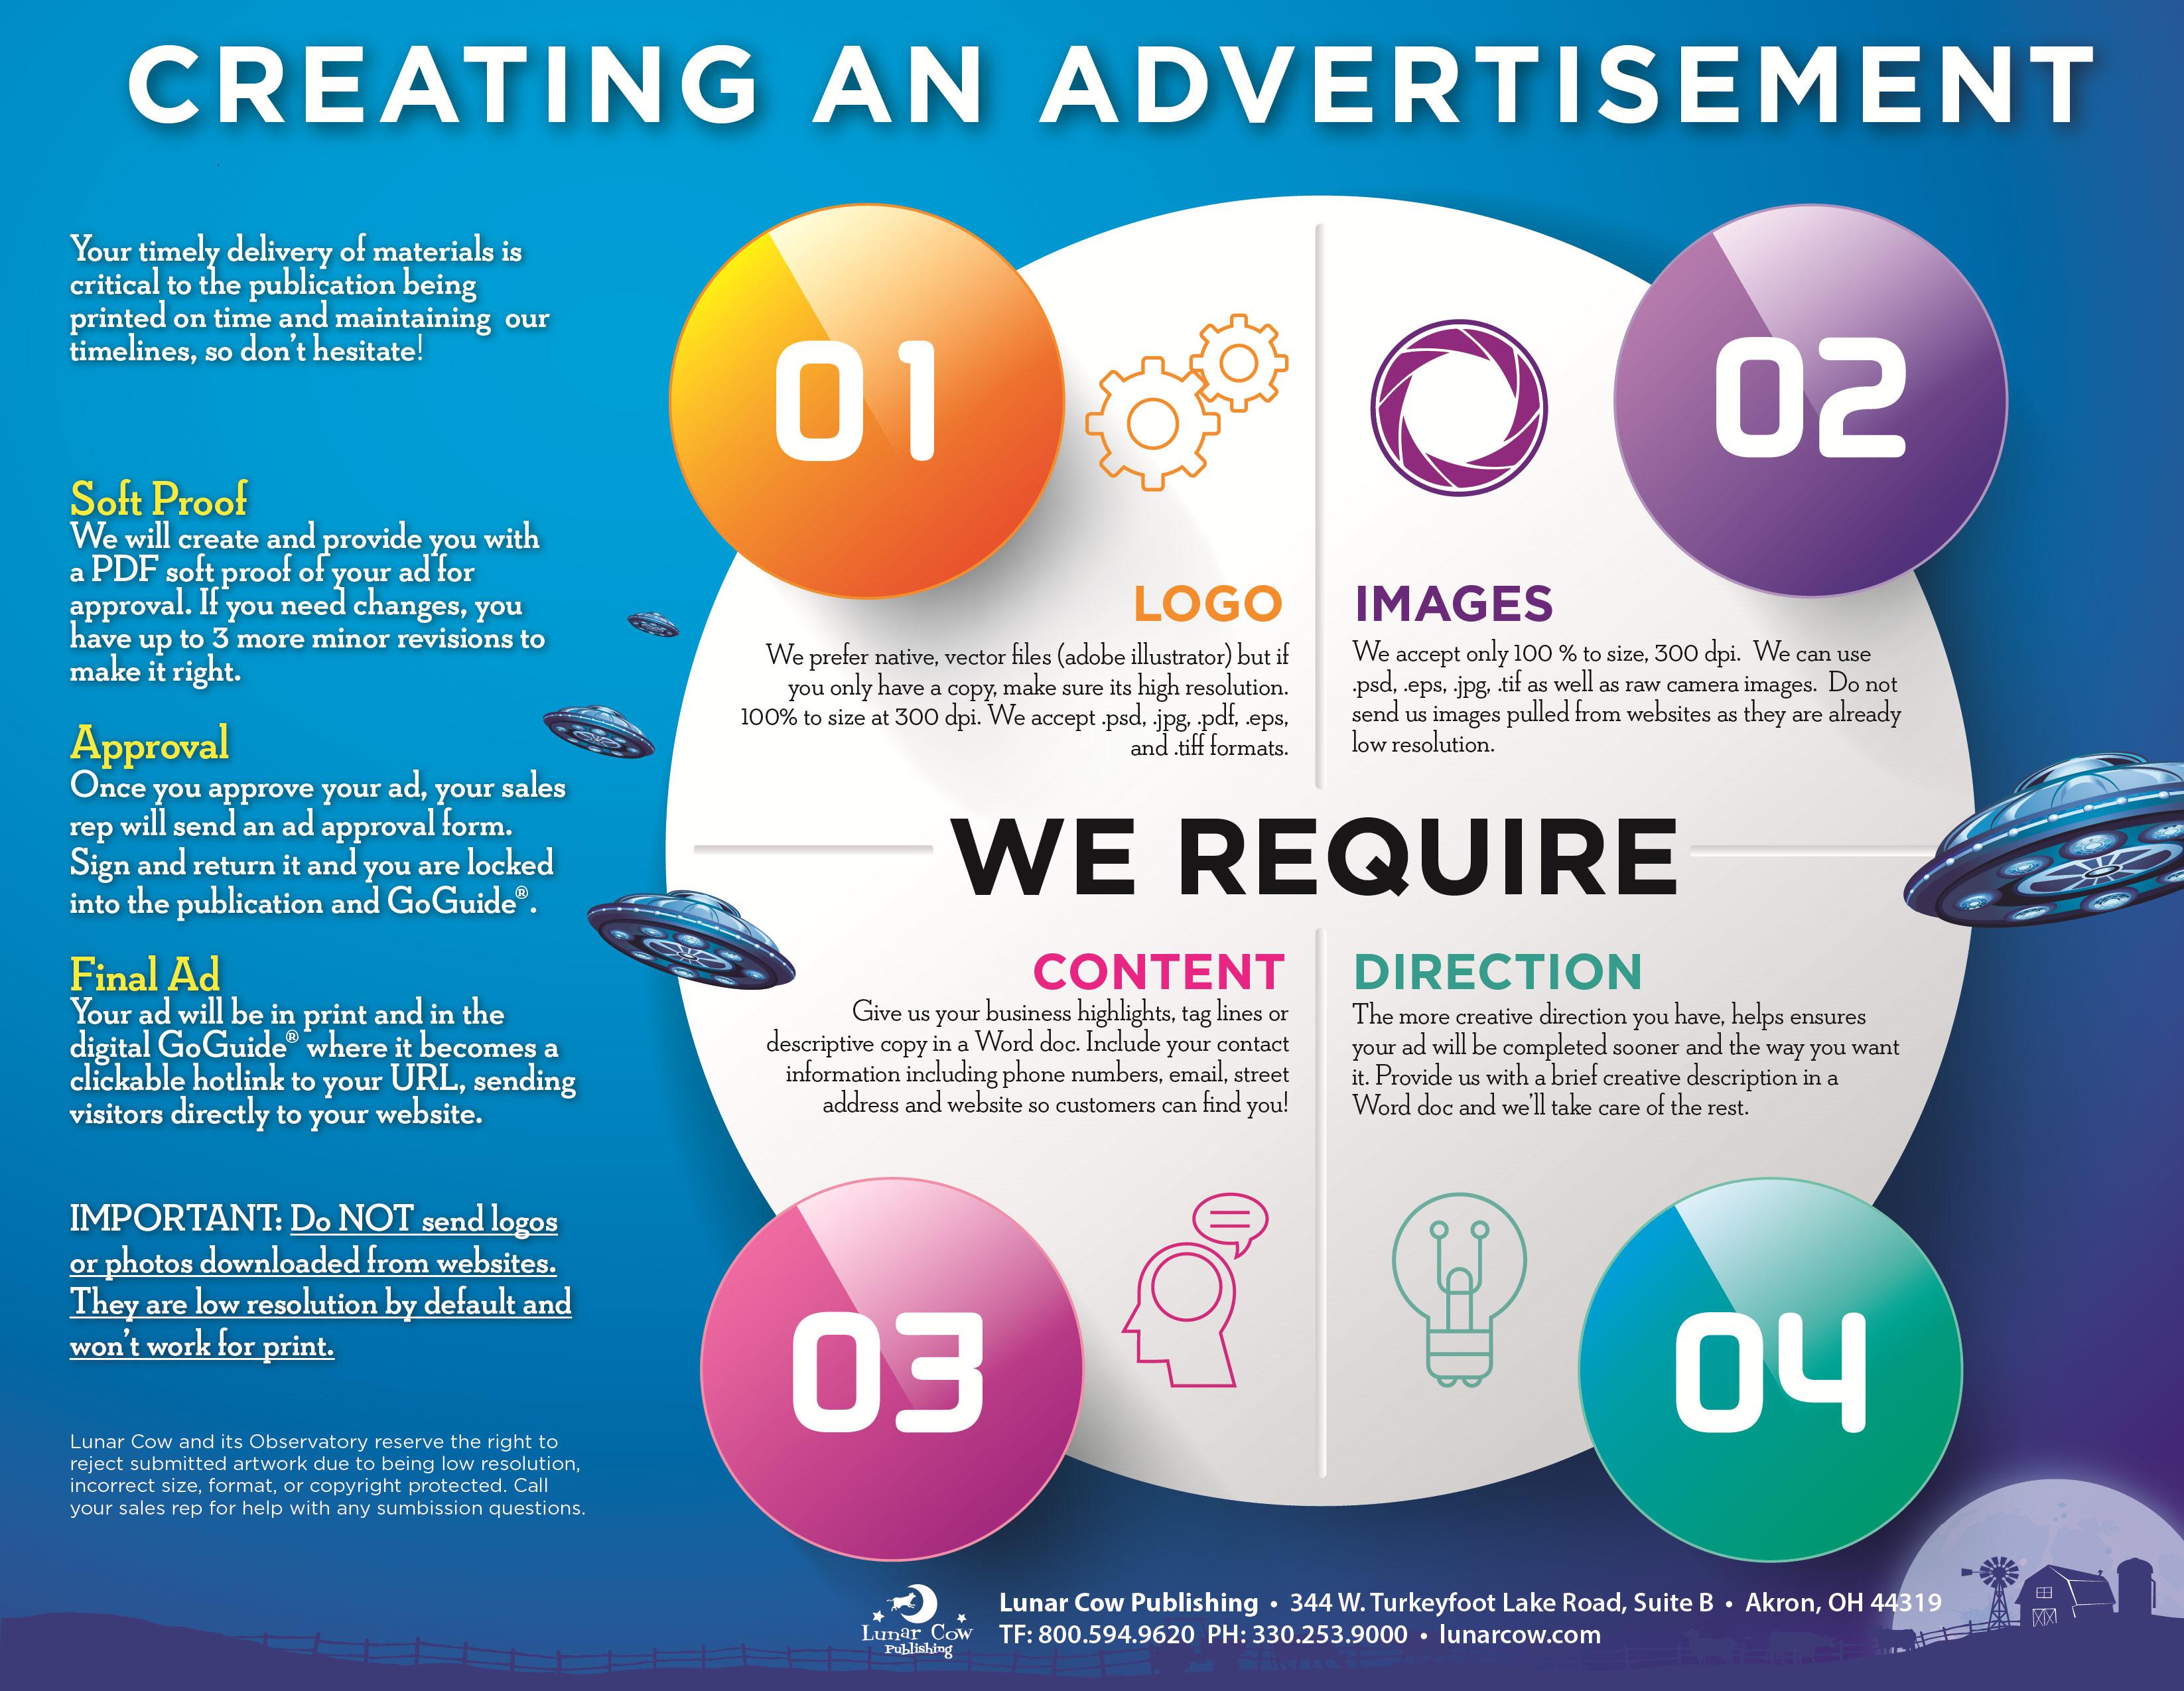 AdCreation_Infographic-Ed-s